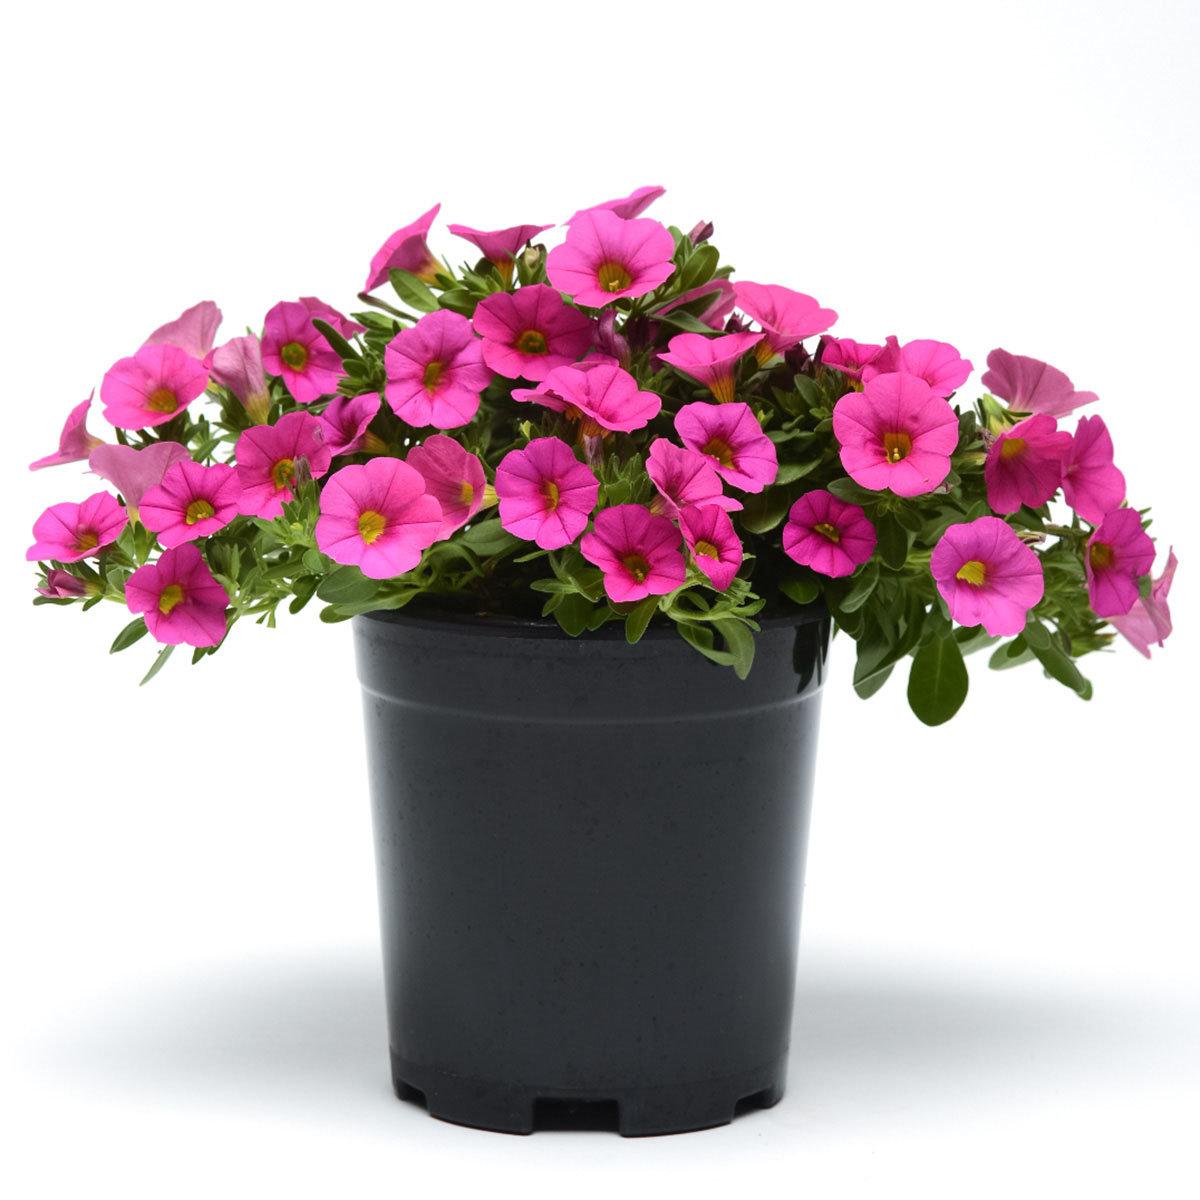 Calibrachoa-Petuniensamen Kabloom Deep Pink F1, Pillensaat | #6